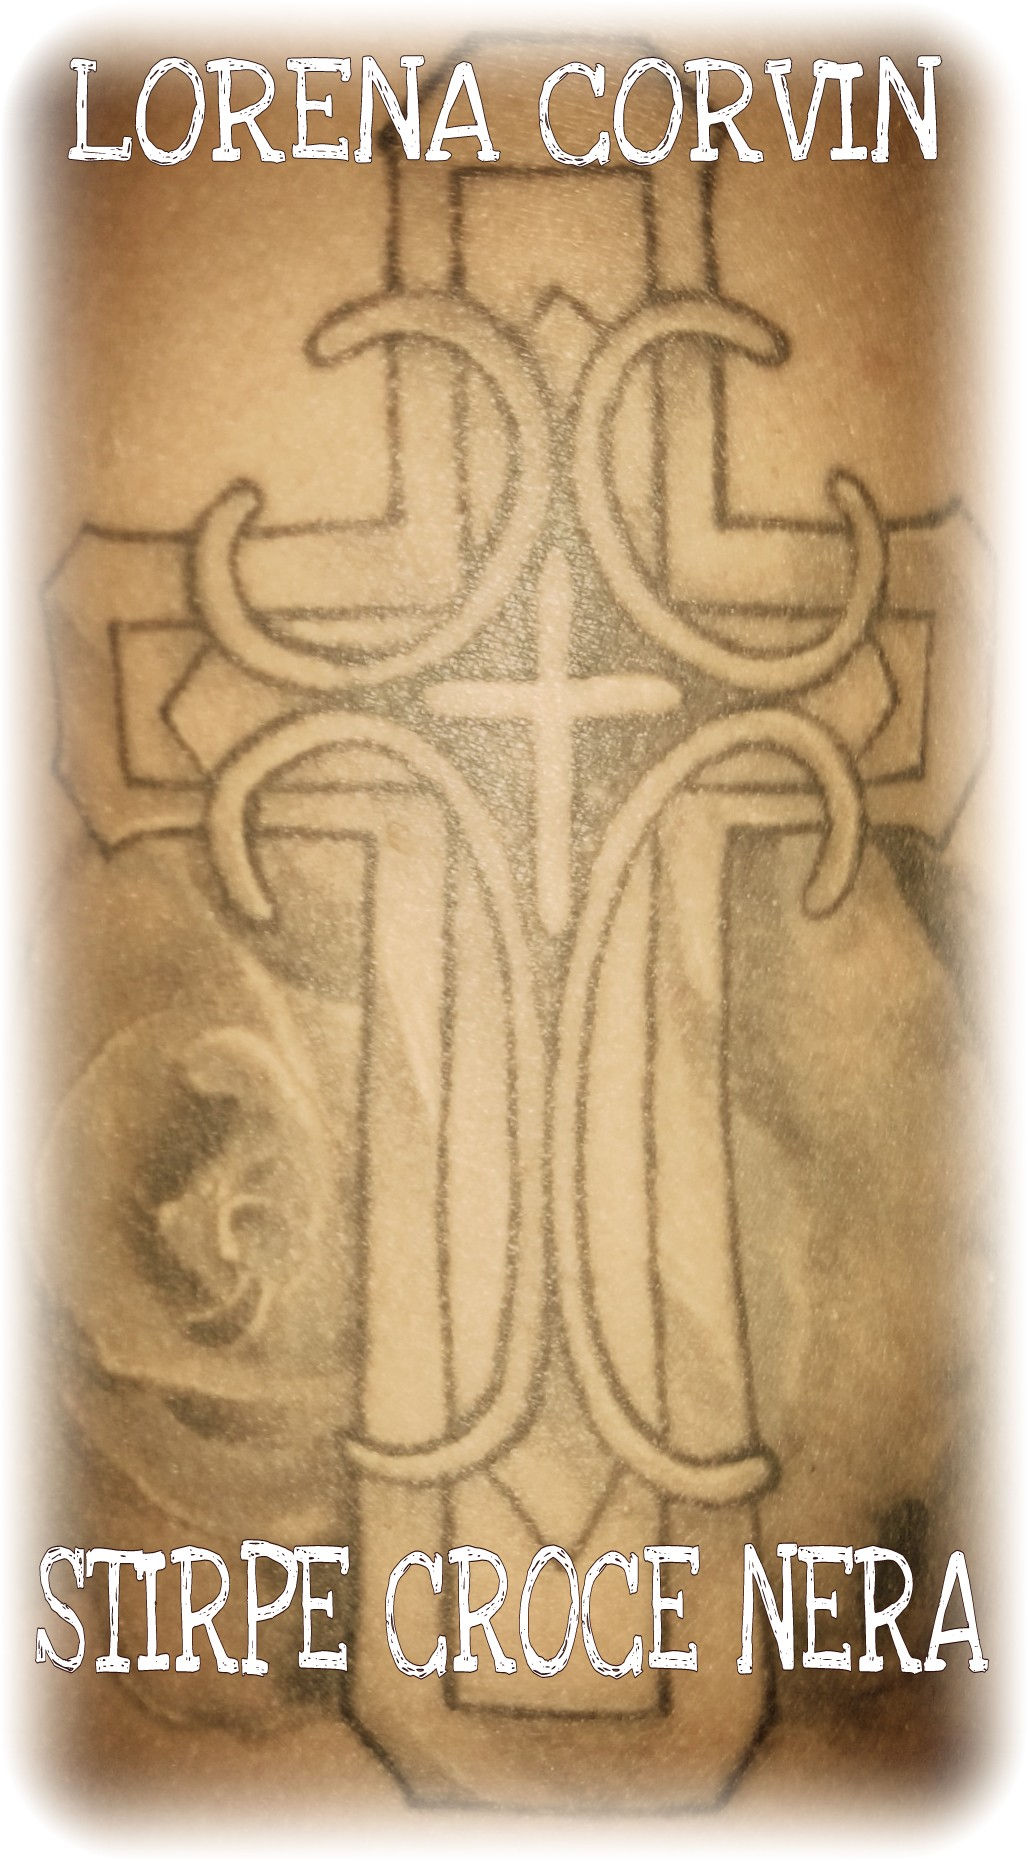 stirpe croce nera lorena corvin